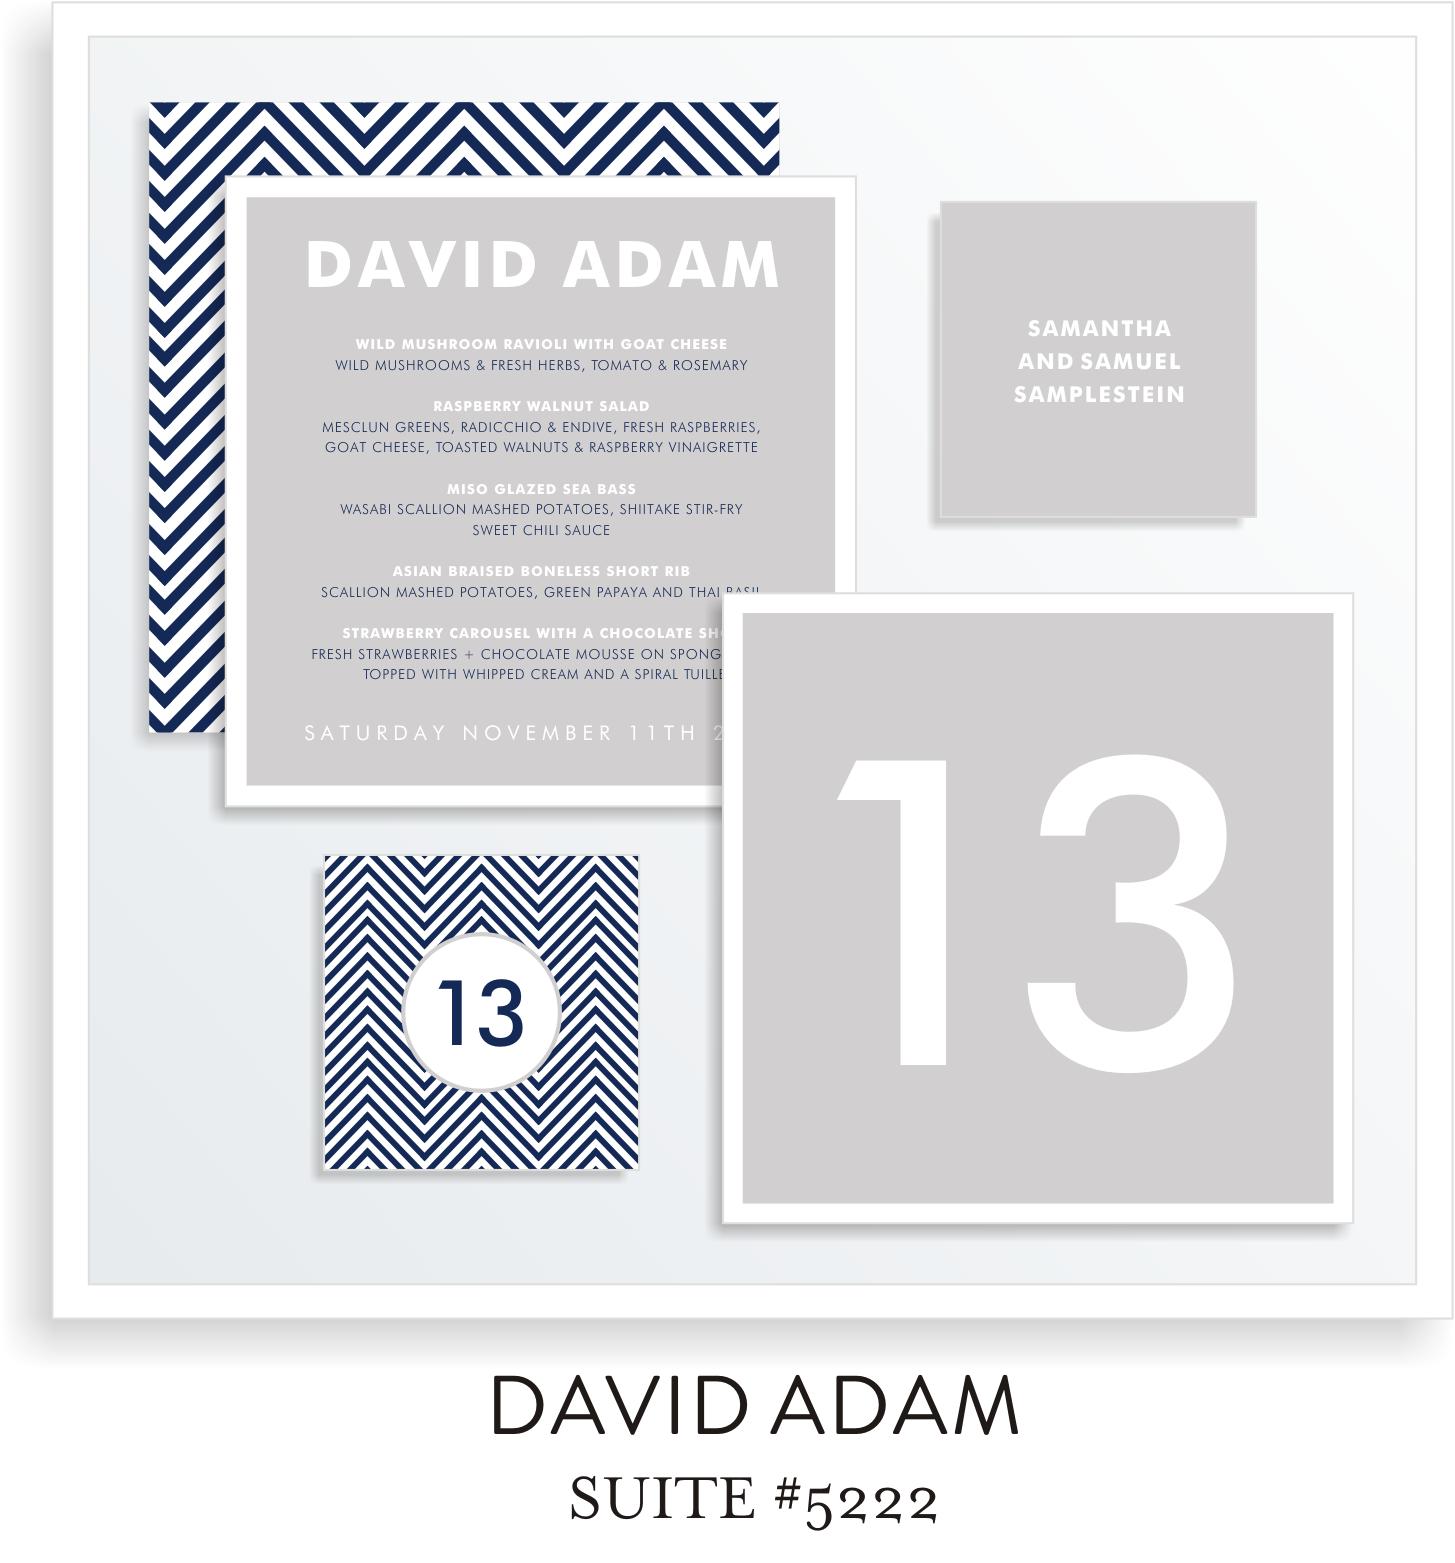 Table Top Decor Suite 5222 - David Adam